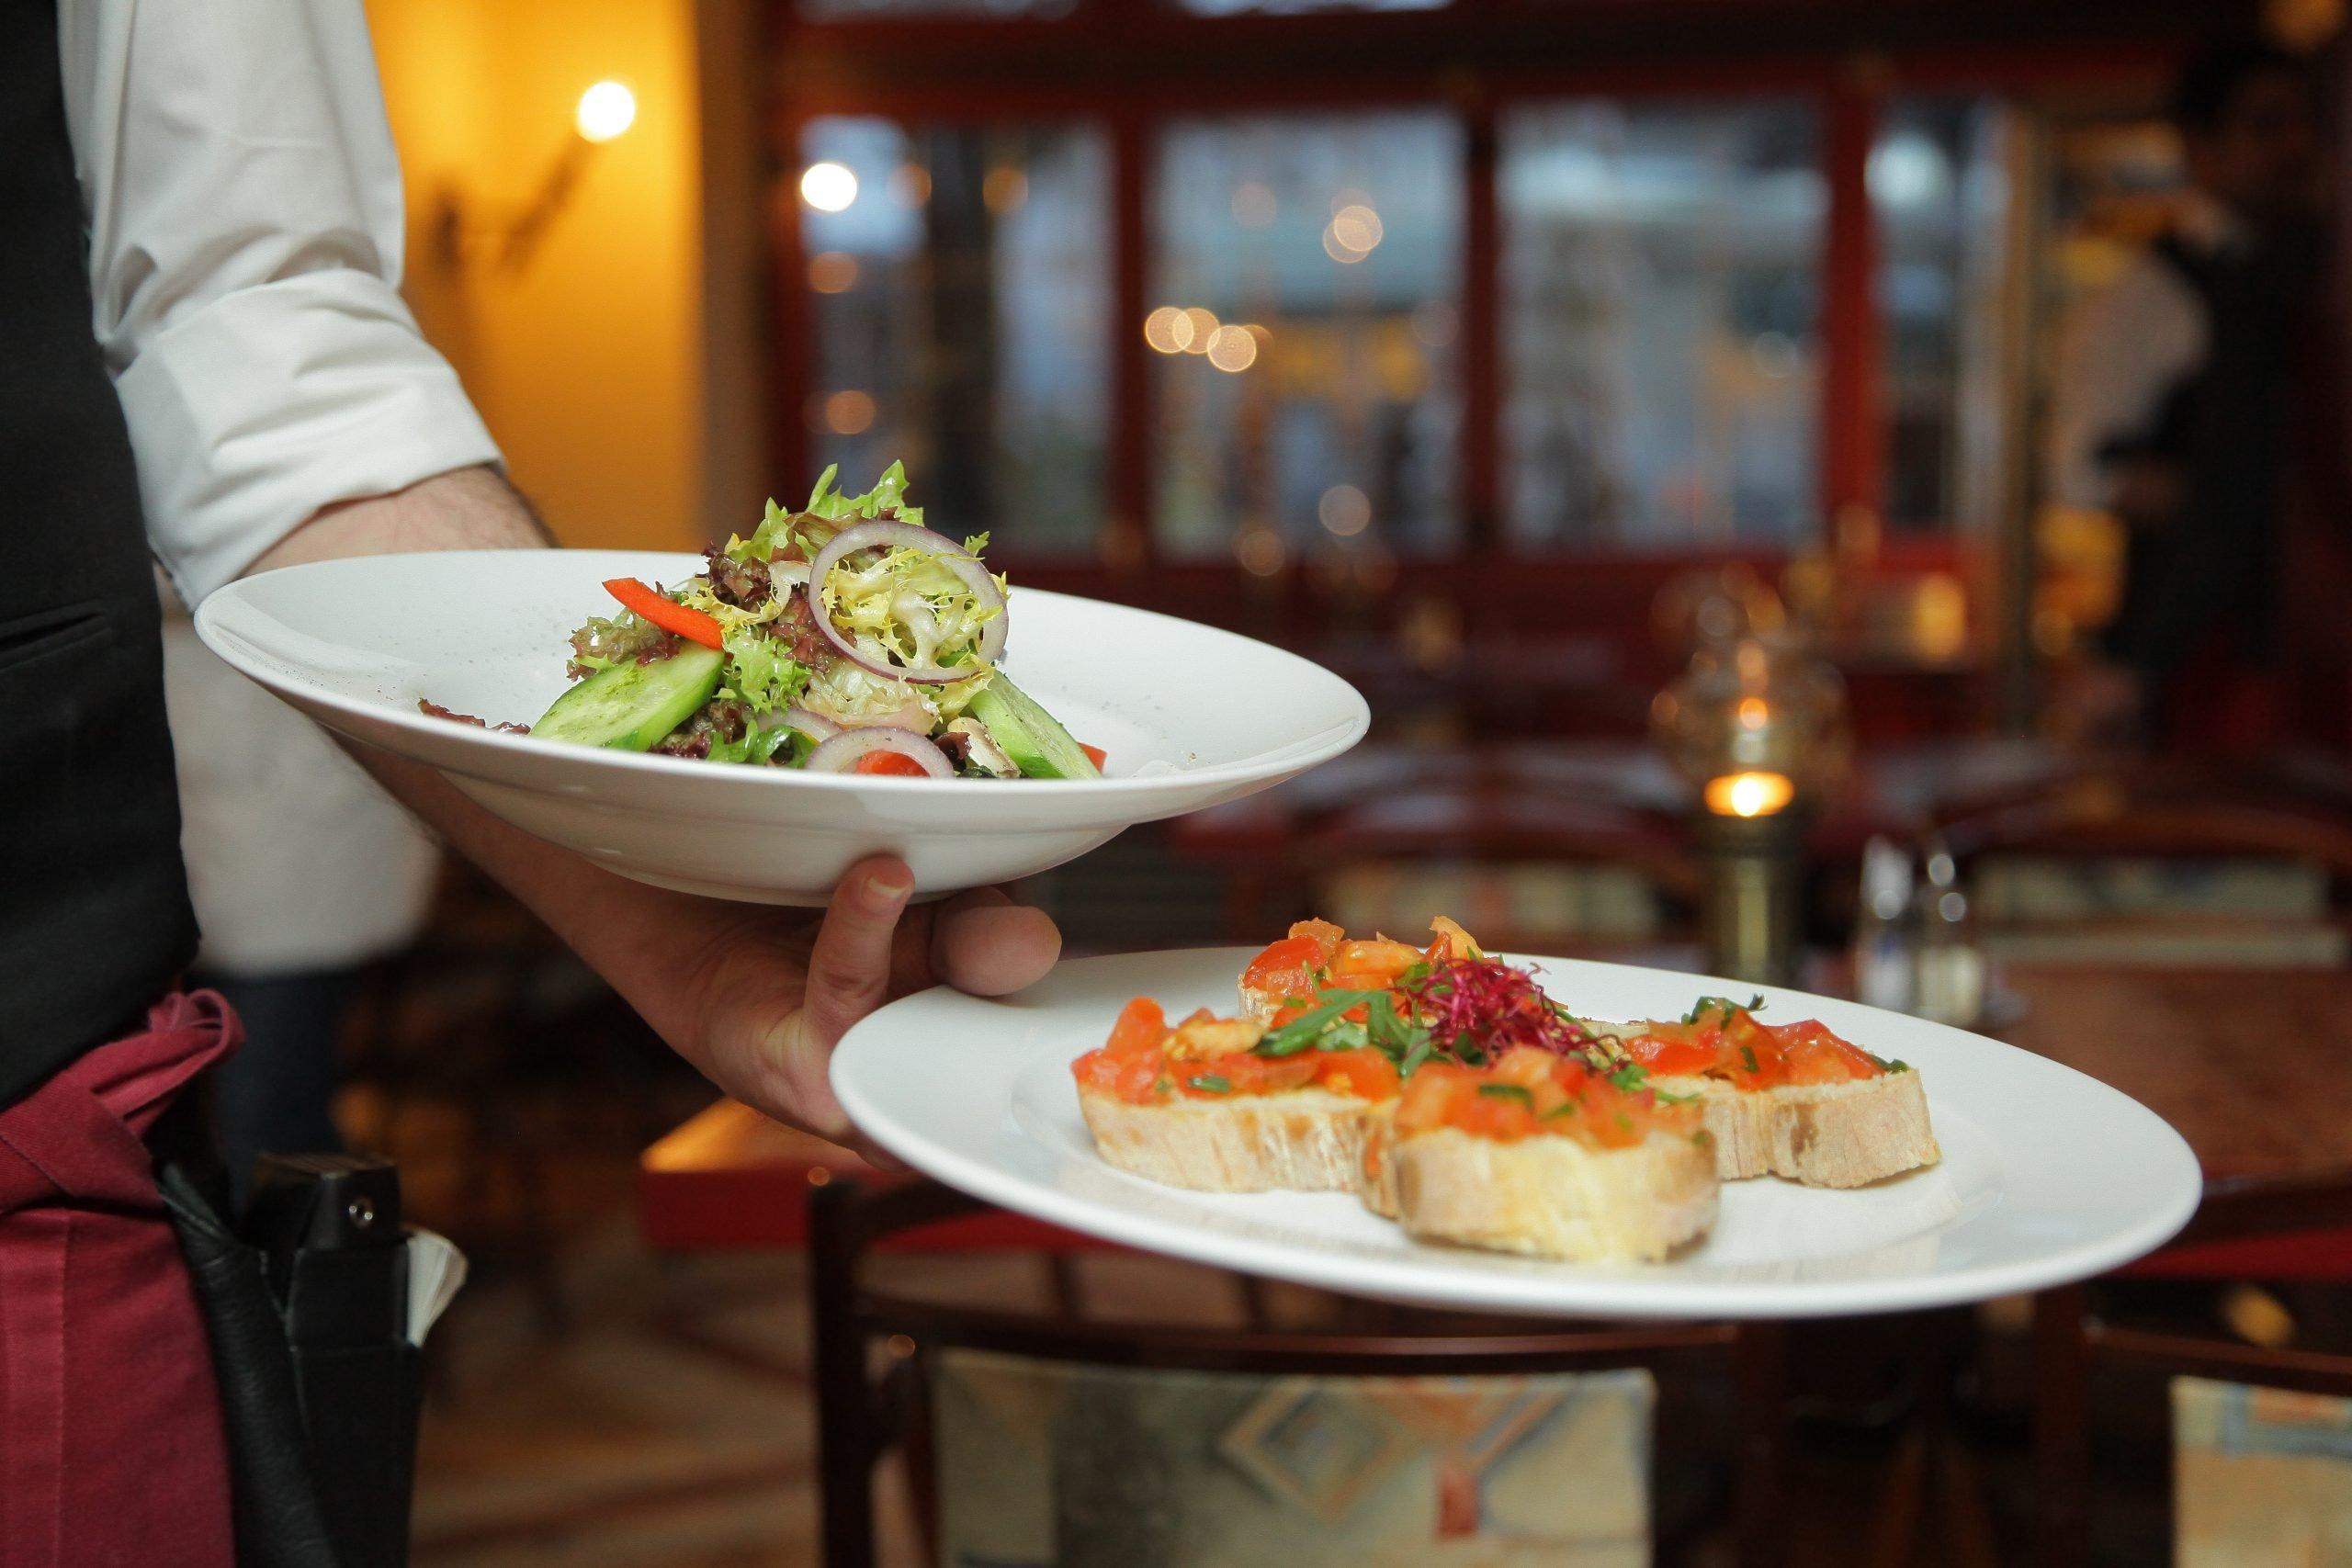 Waiter Plates Table